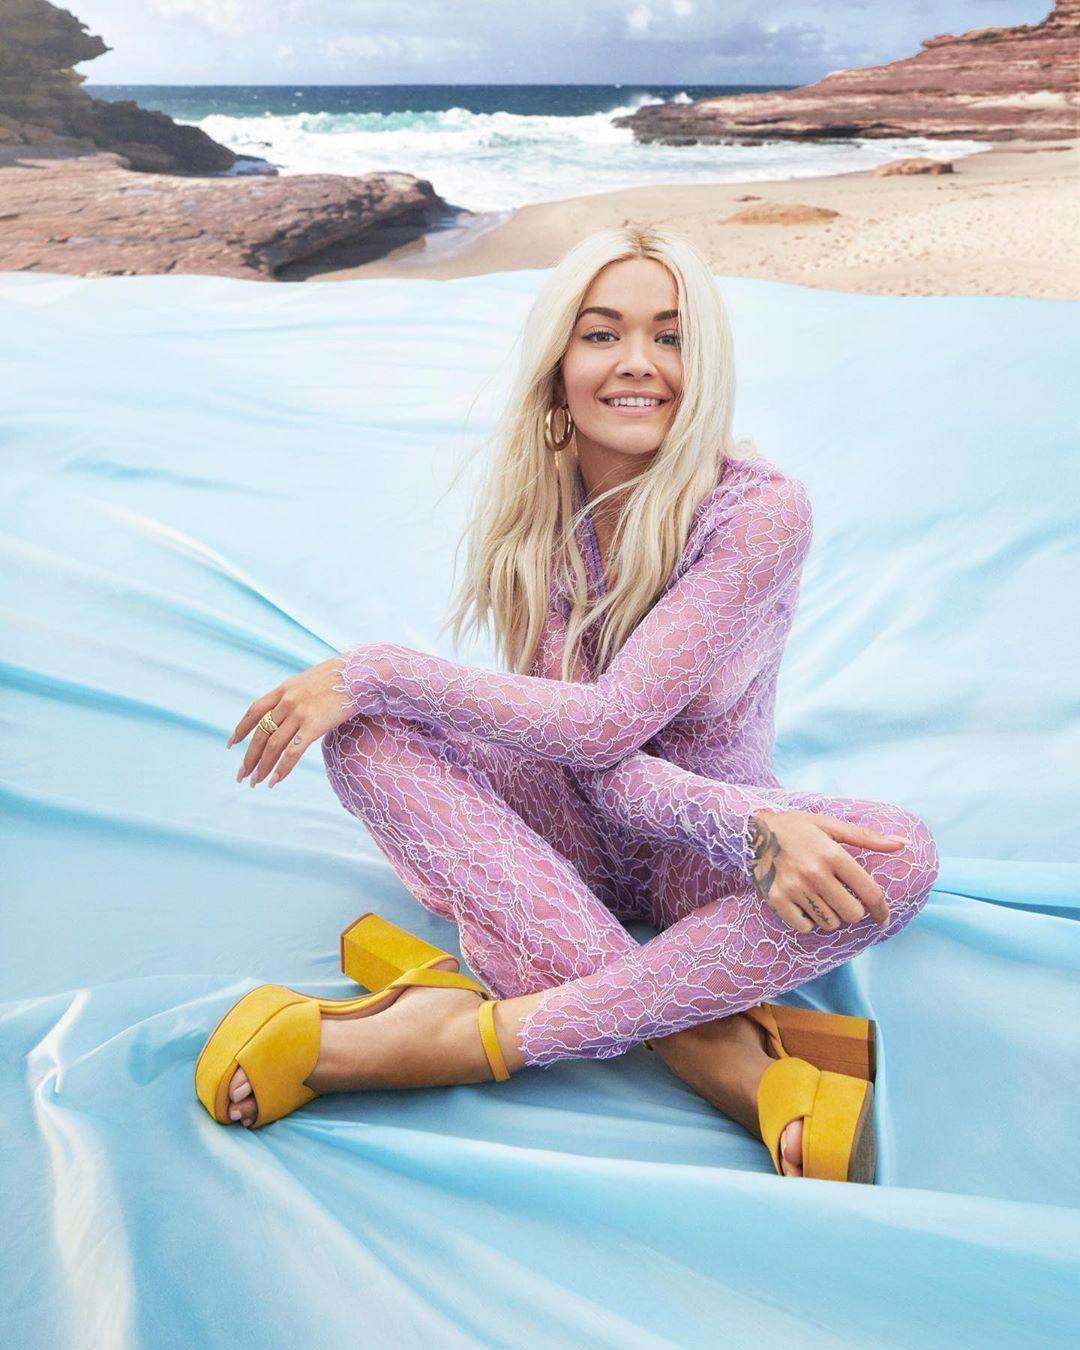 Rita Ora Super Hot Photoshoot Image Gallery